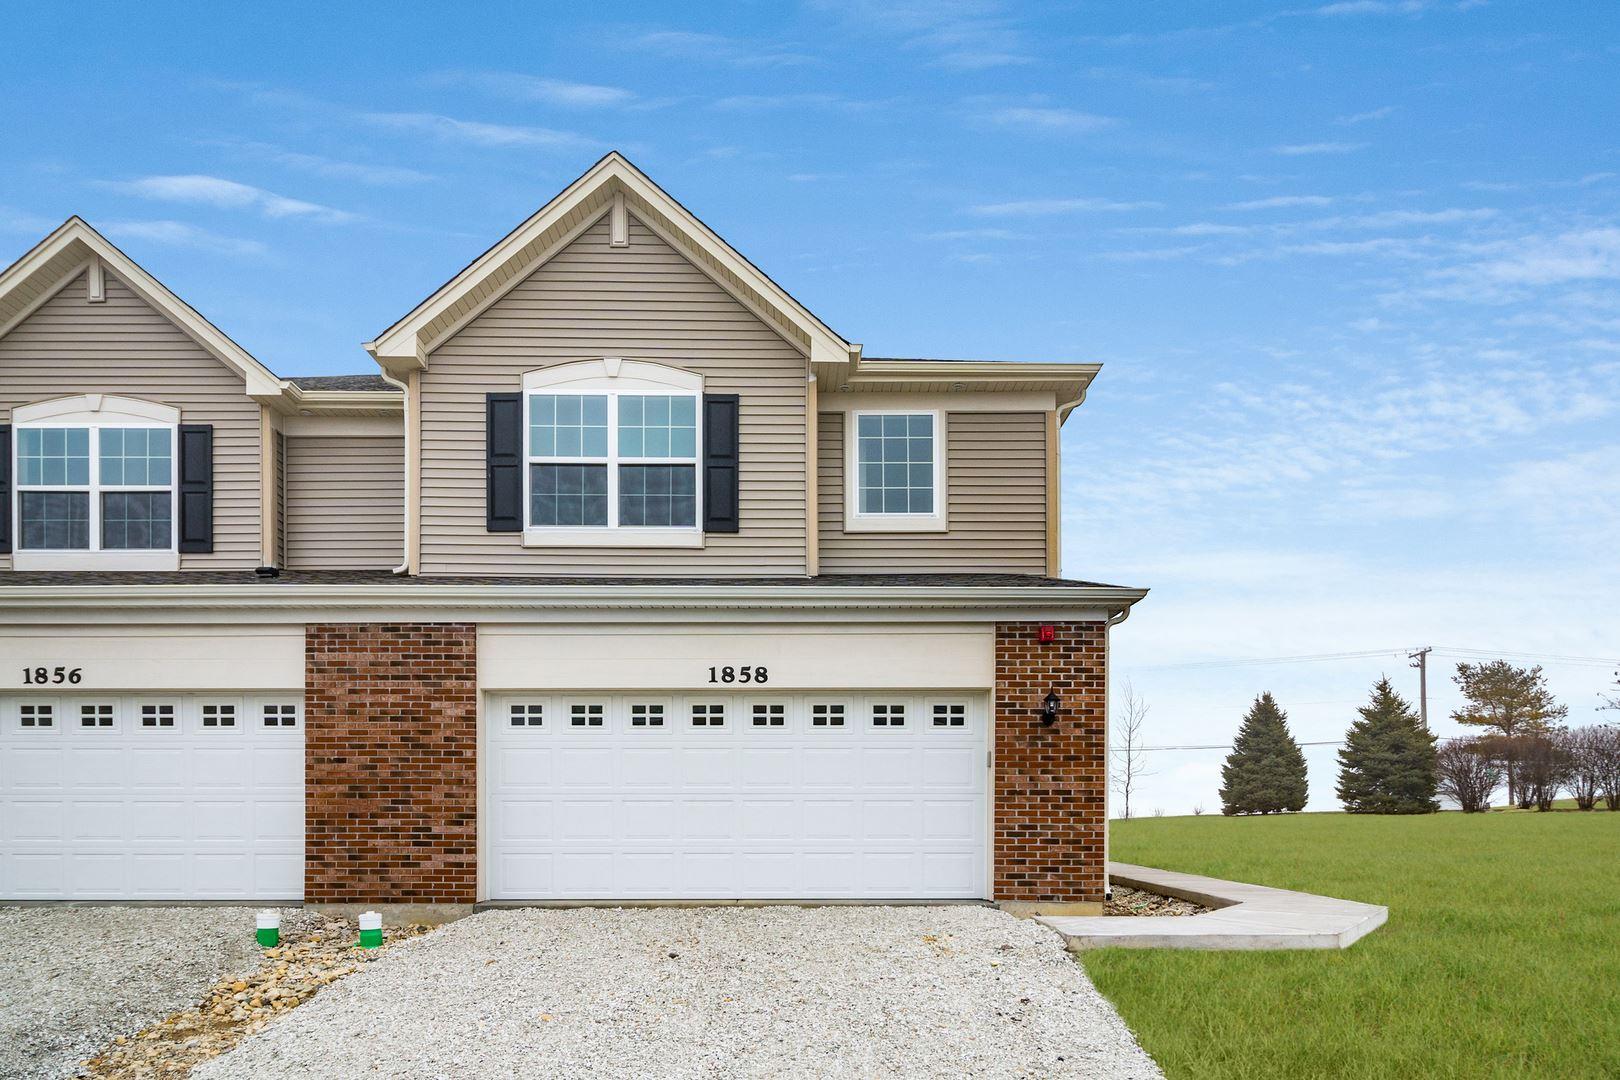 1881 Wren Road, Yorkville, IL 60560 - #: 10694009